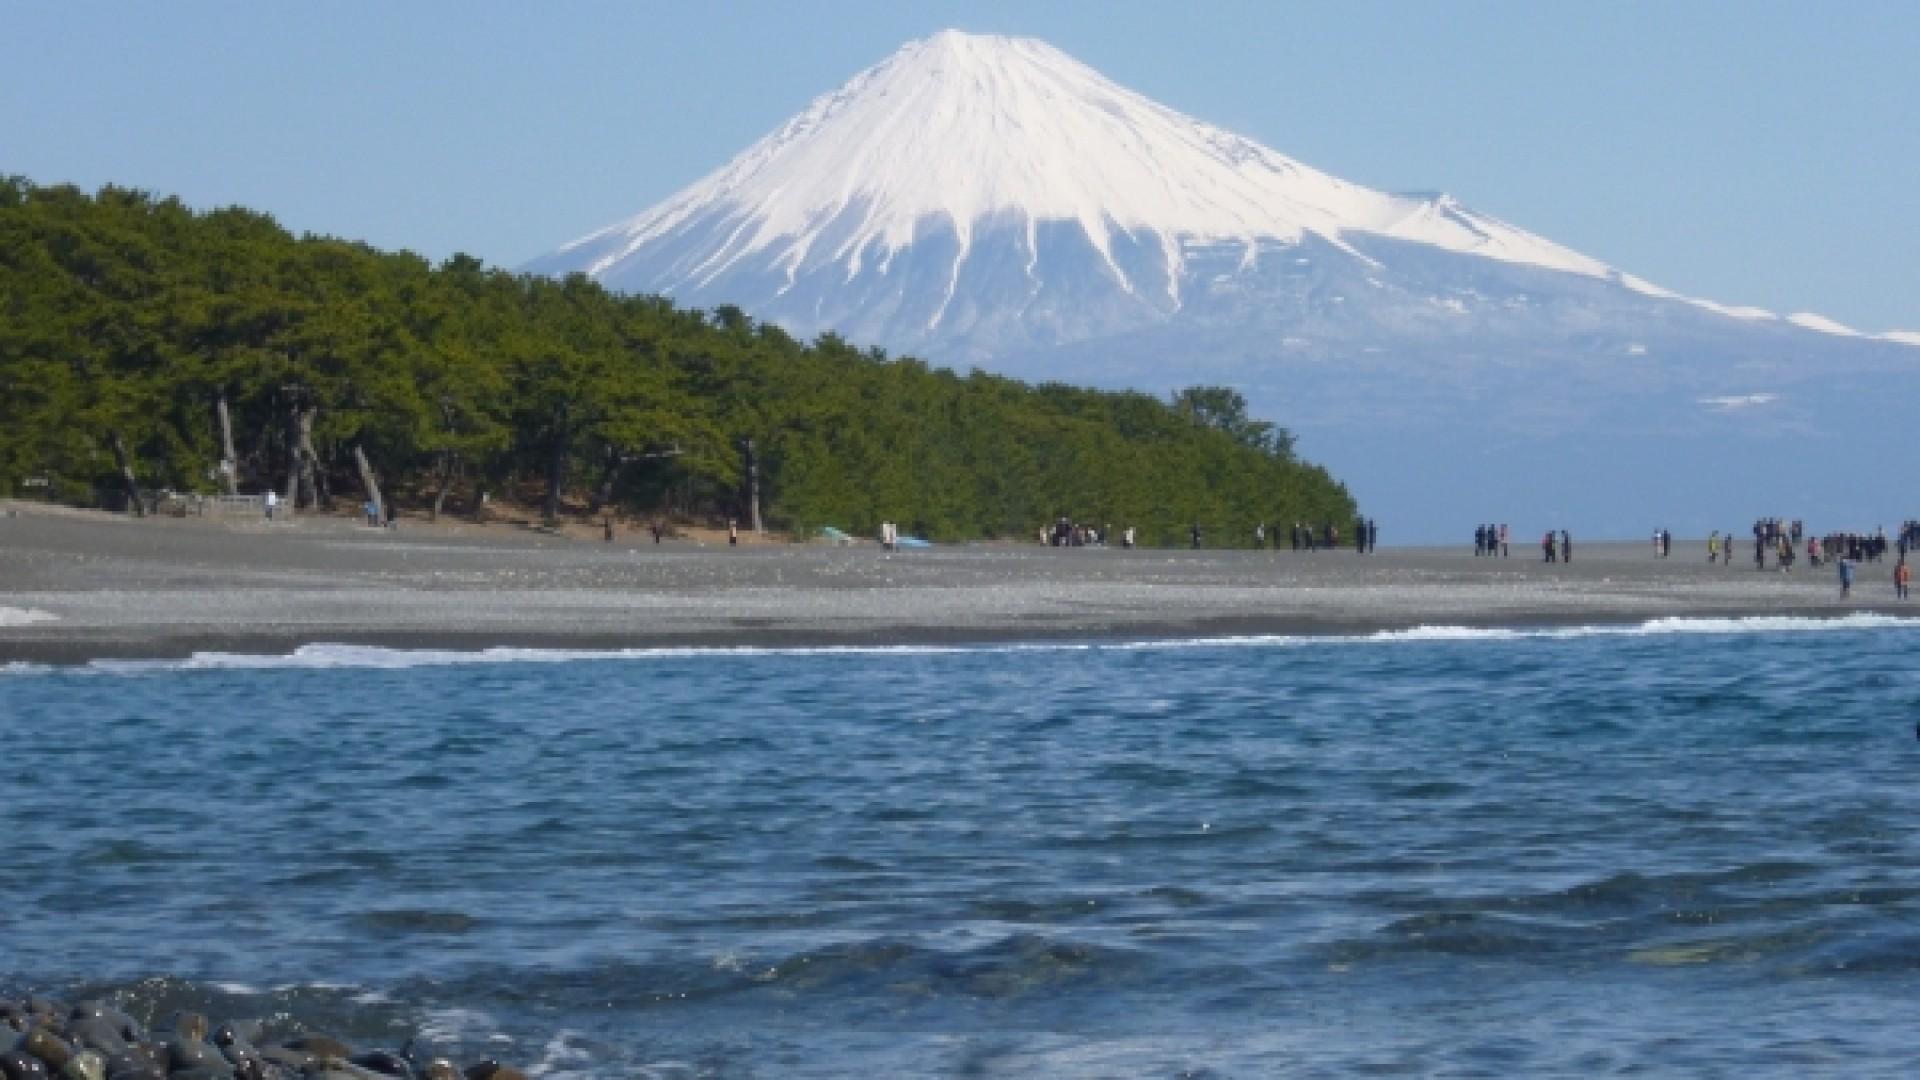 Miho no Matsubara (Miho Pine Grove)